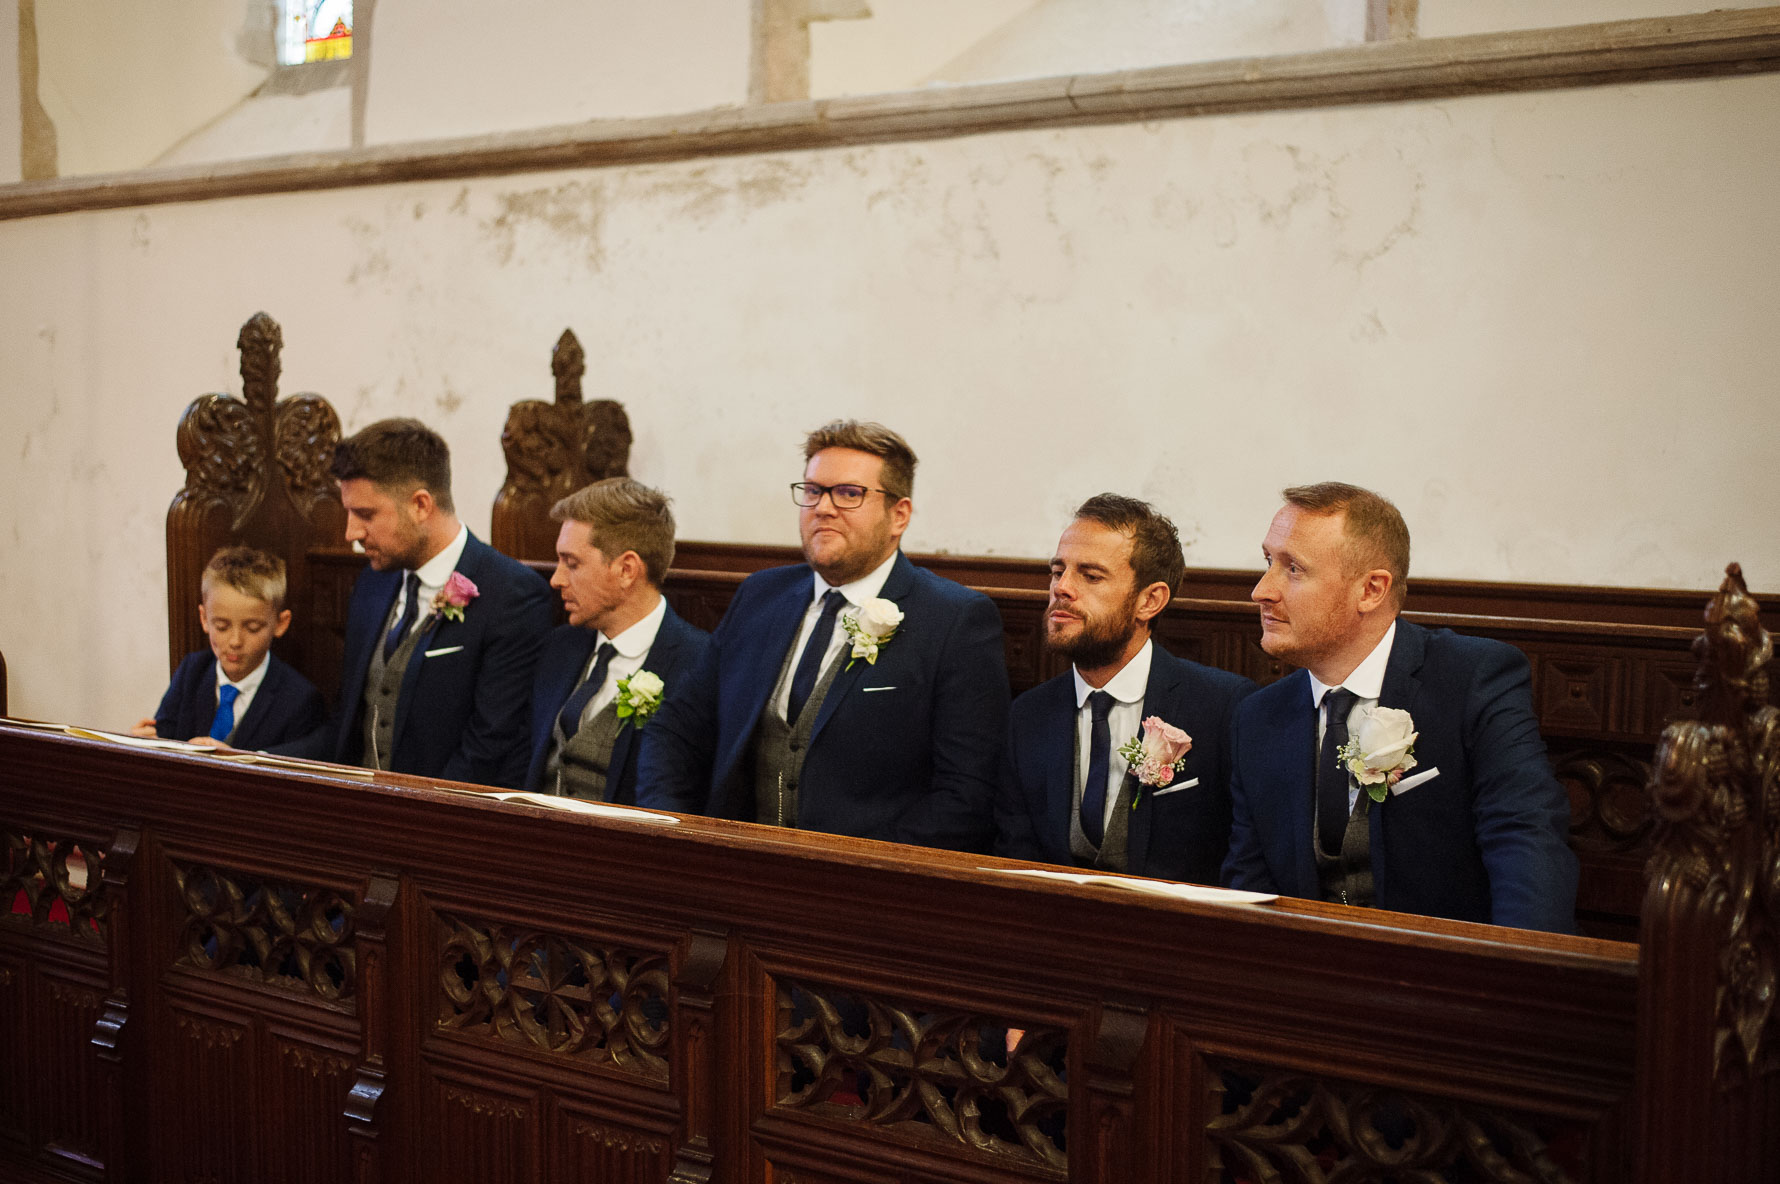 Canterbury Cathedral Lodge Wedding34-20141004 0542